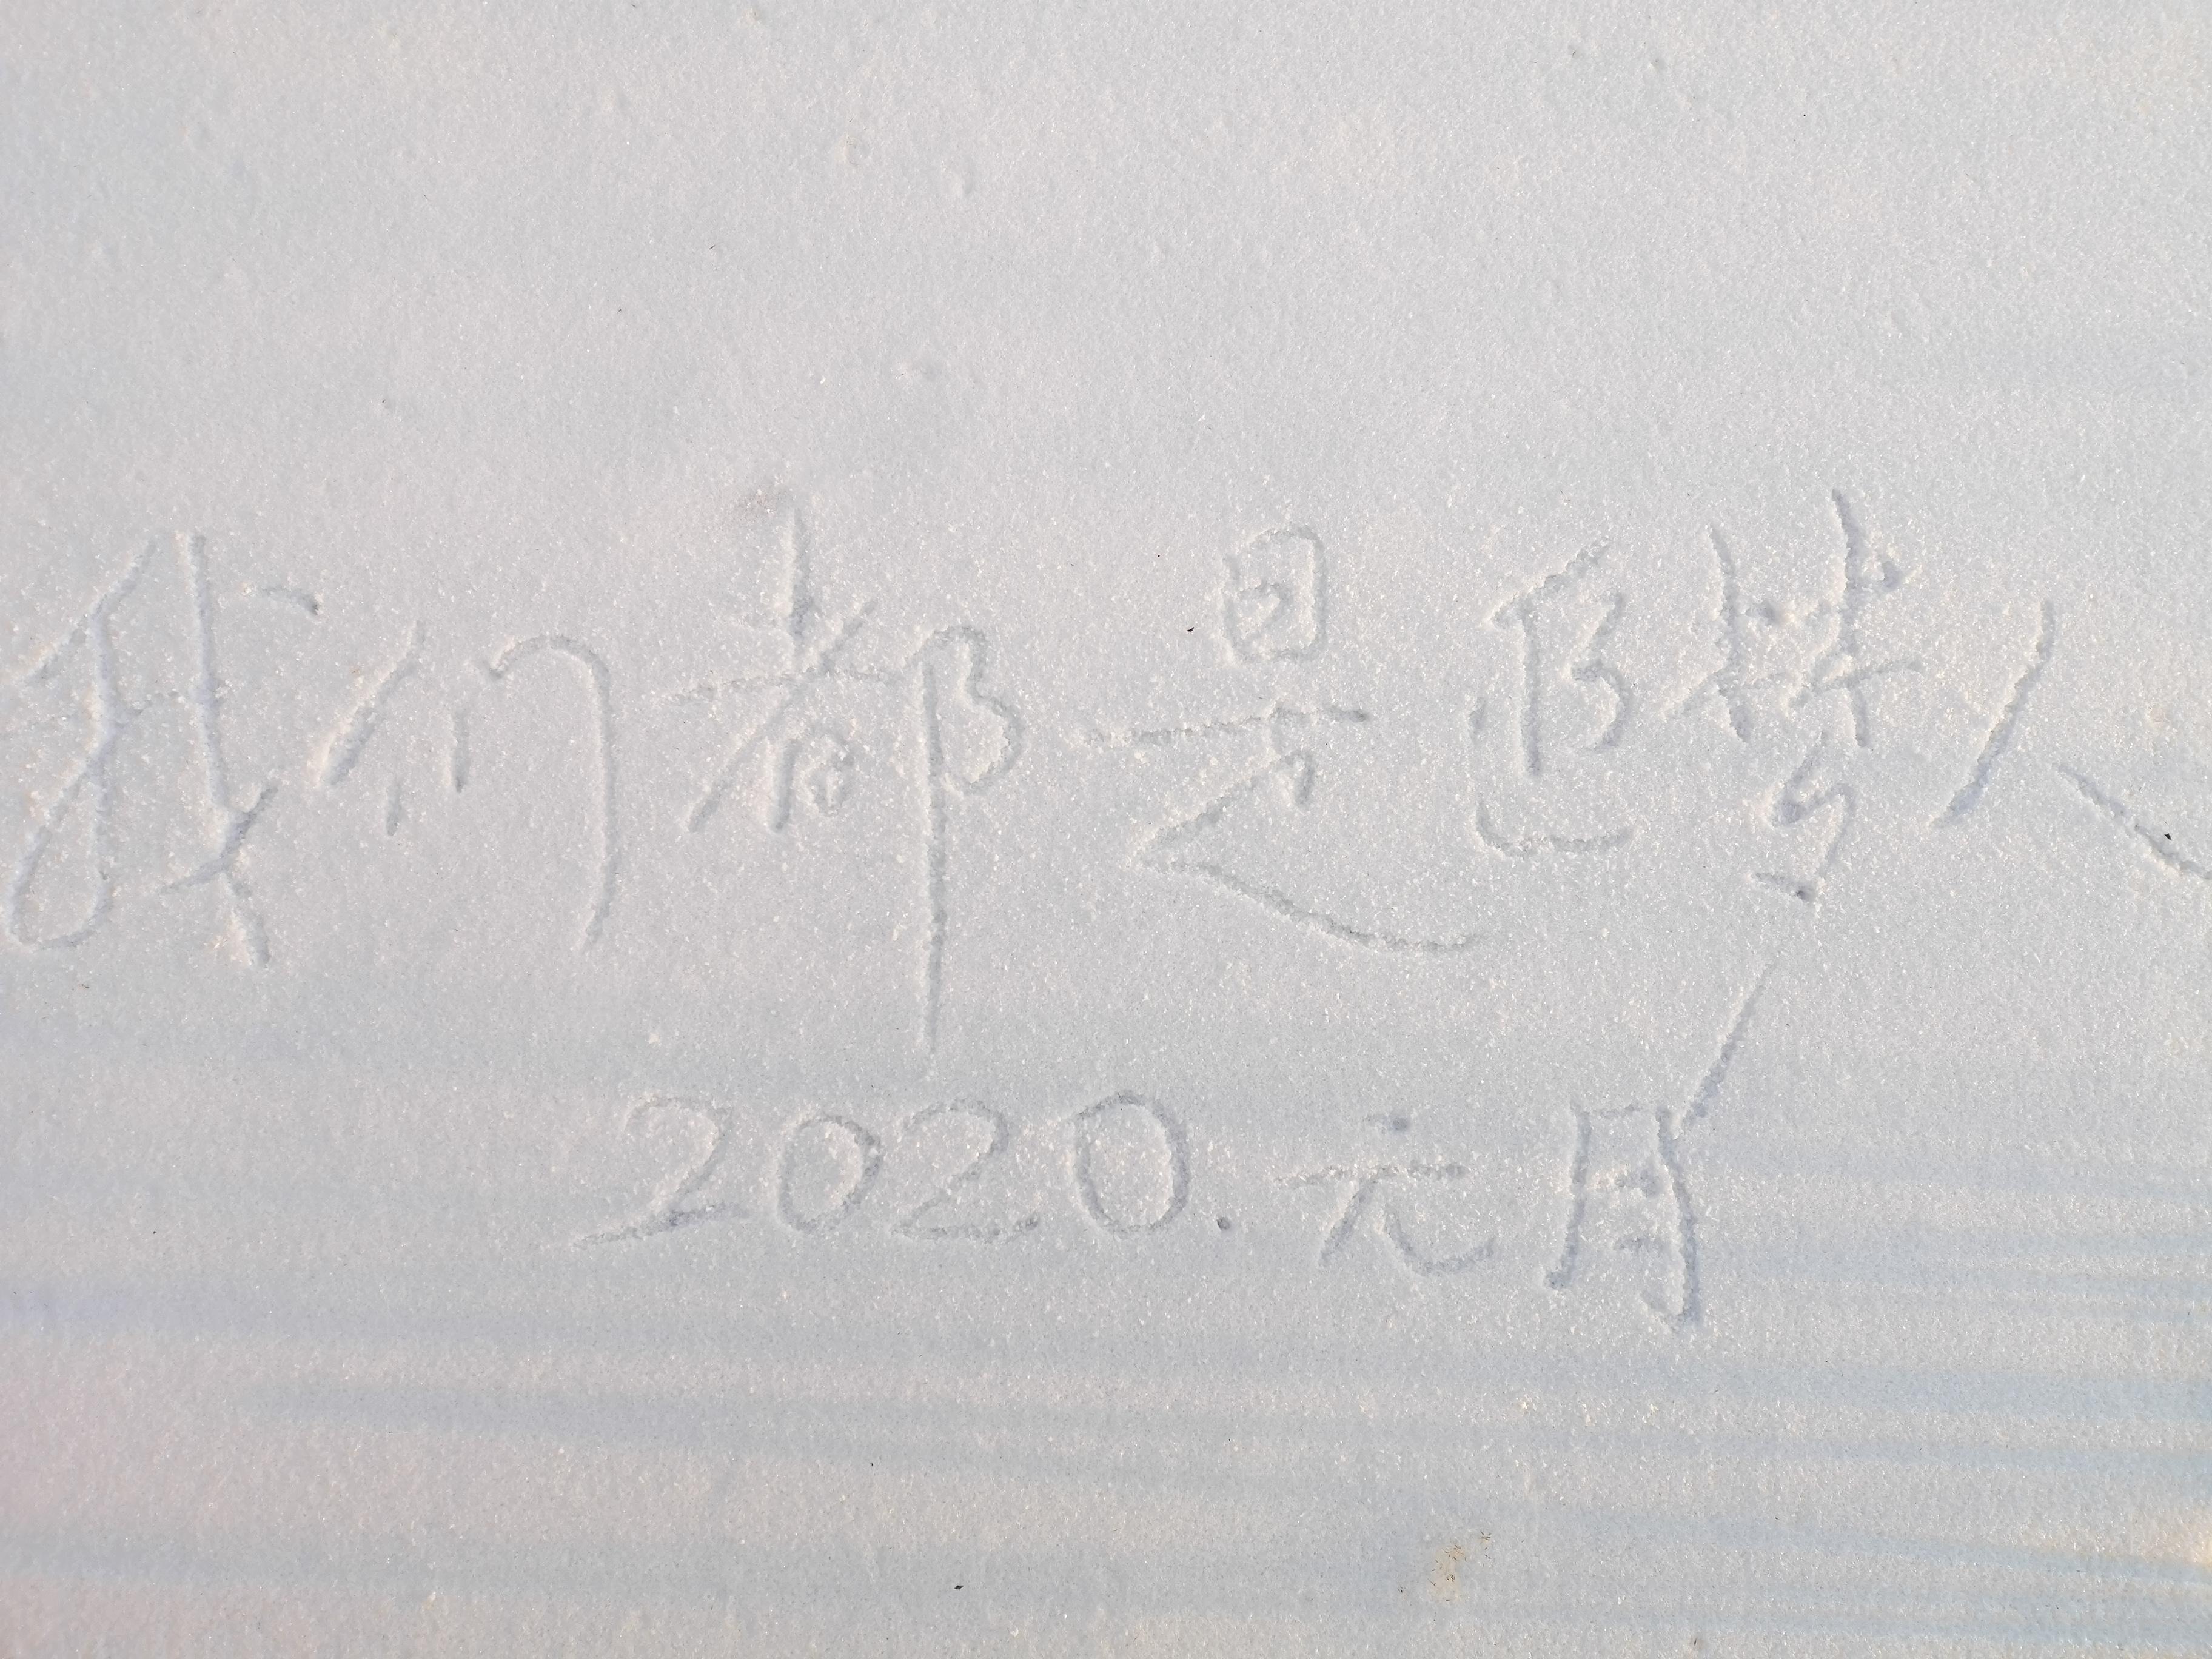 IMG_20200101_160458.jpg